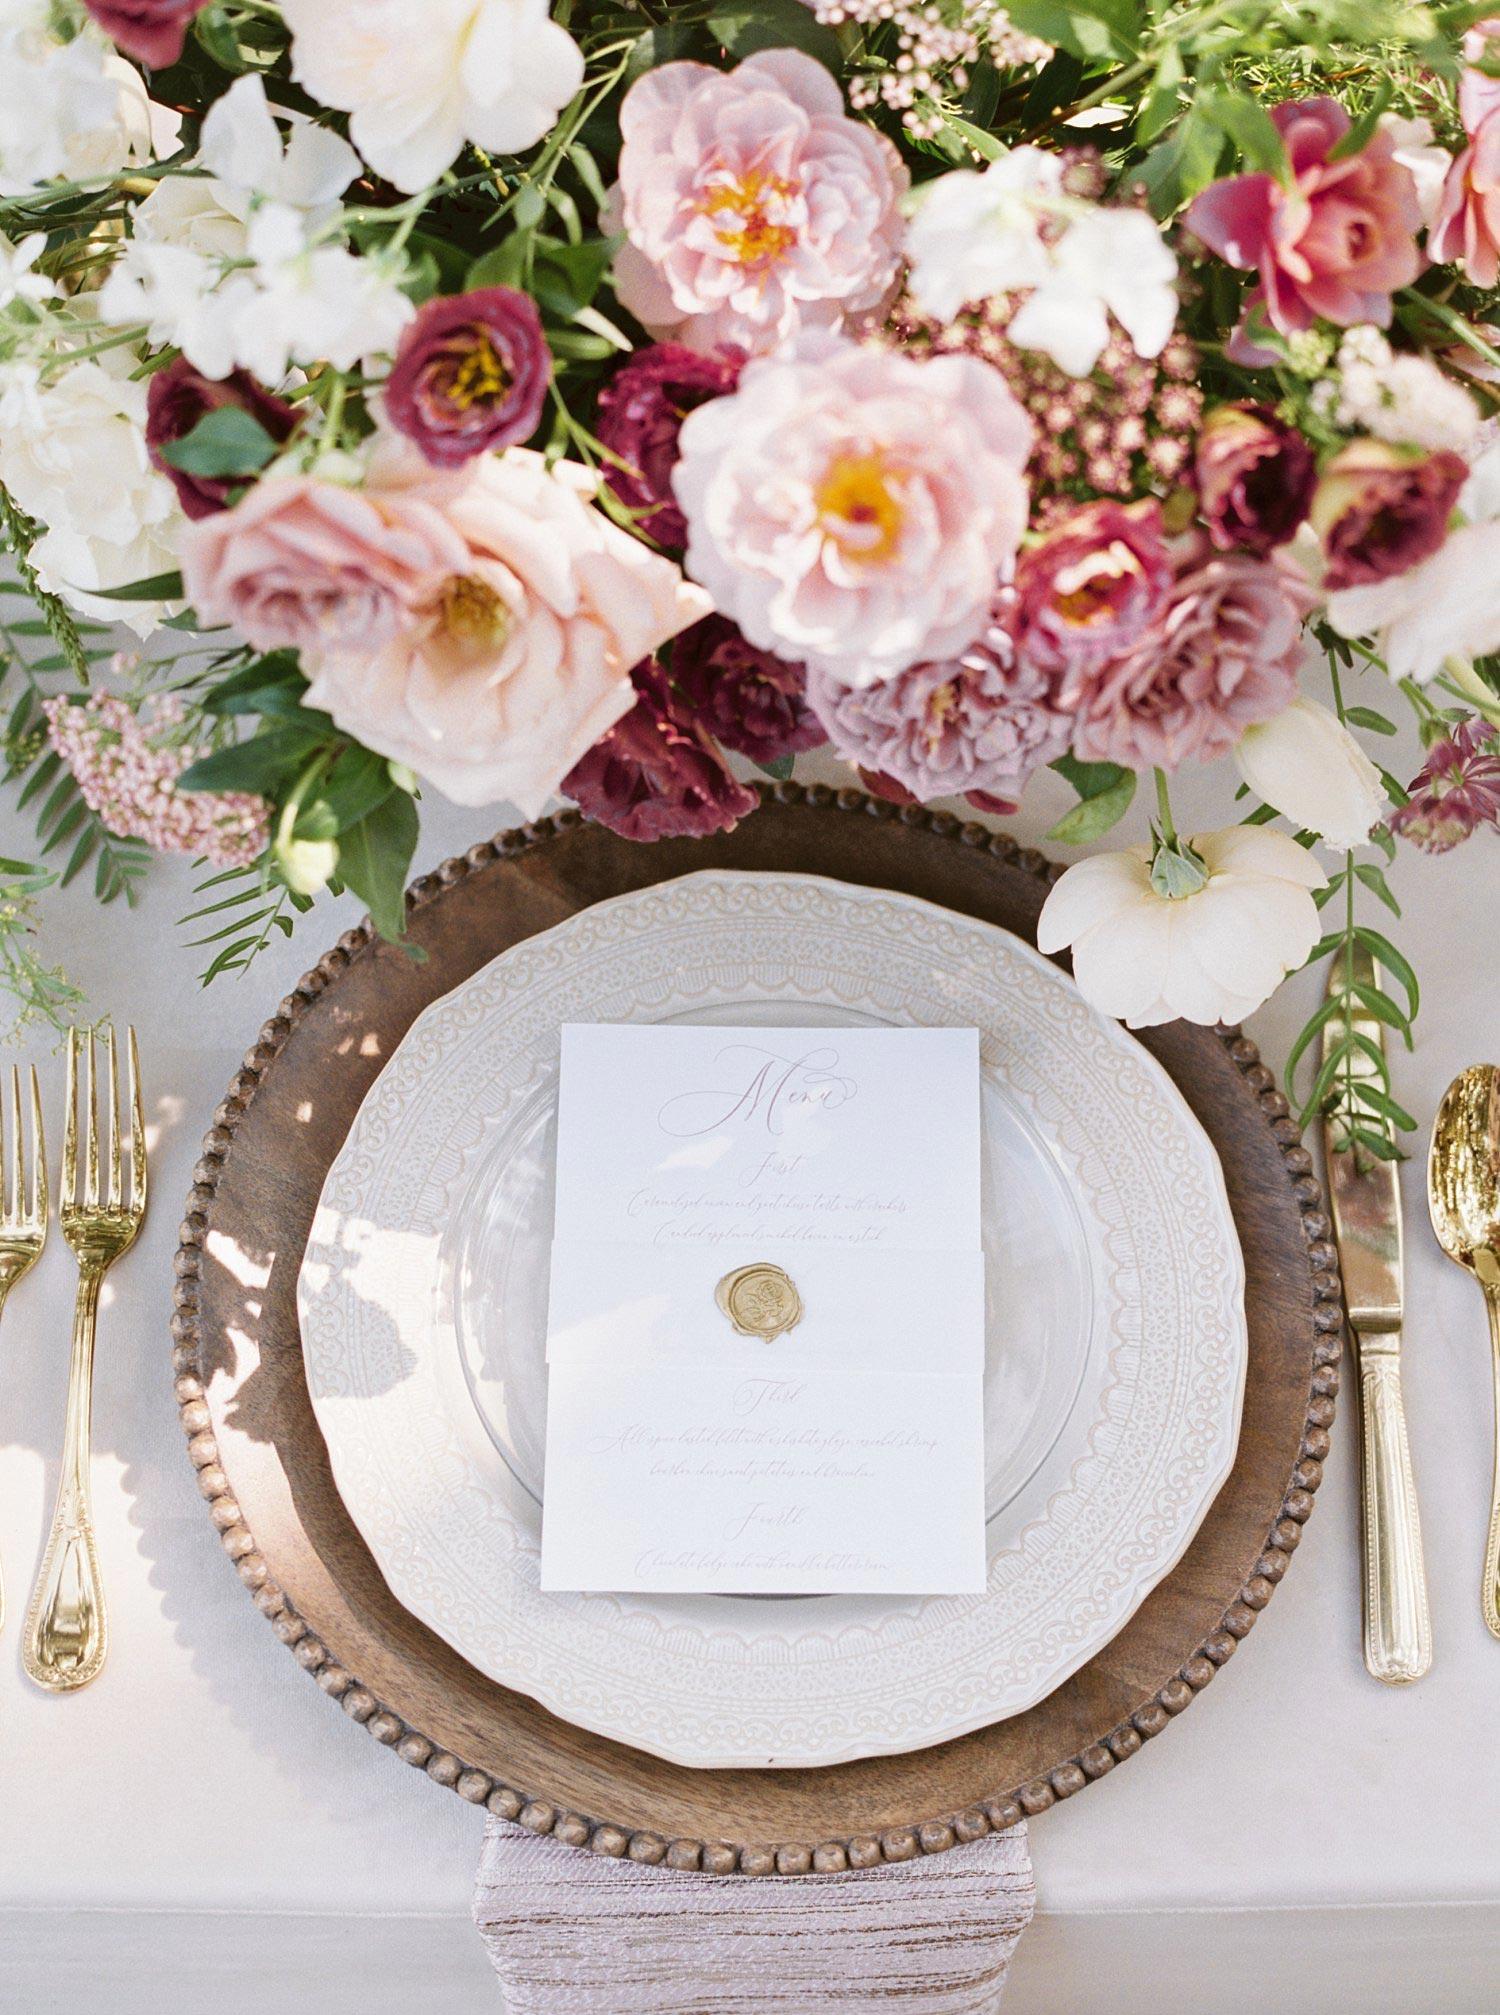 Fine art menu with a gold wax seal